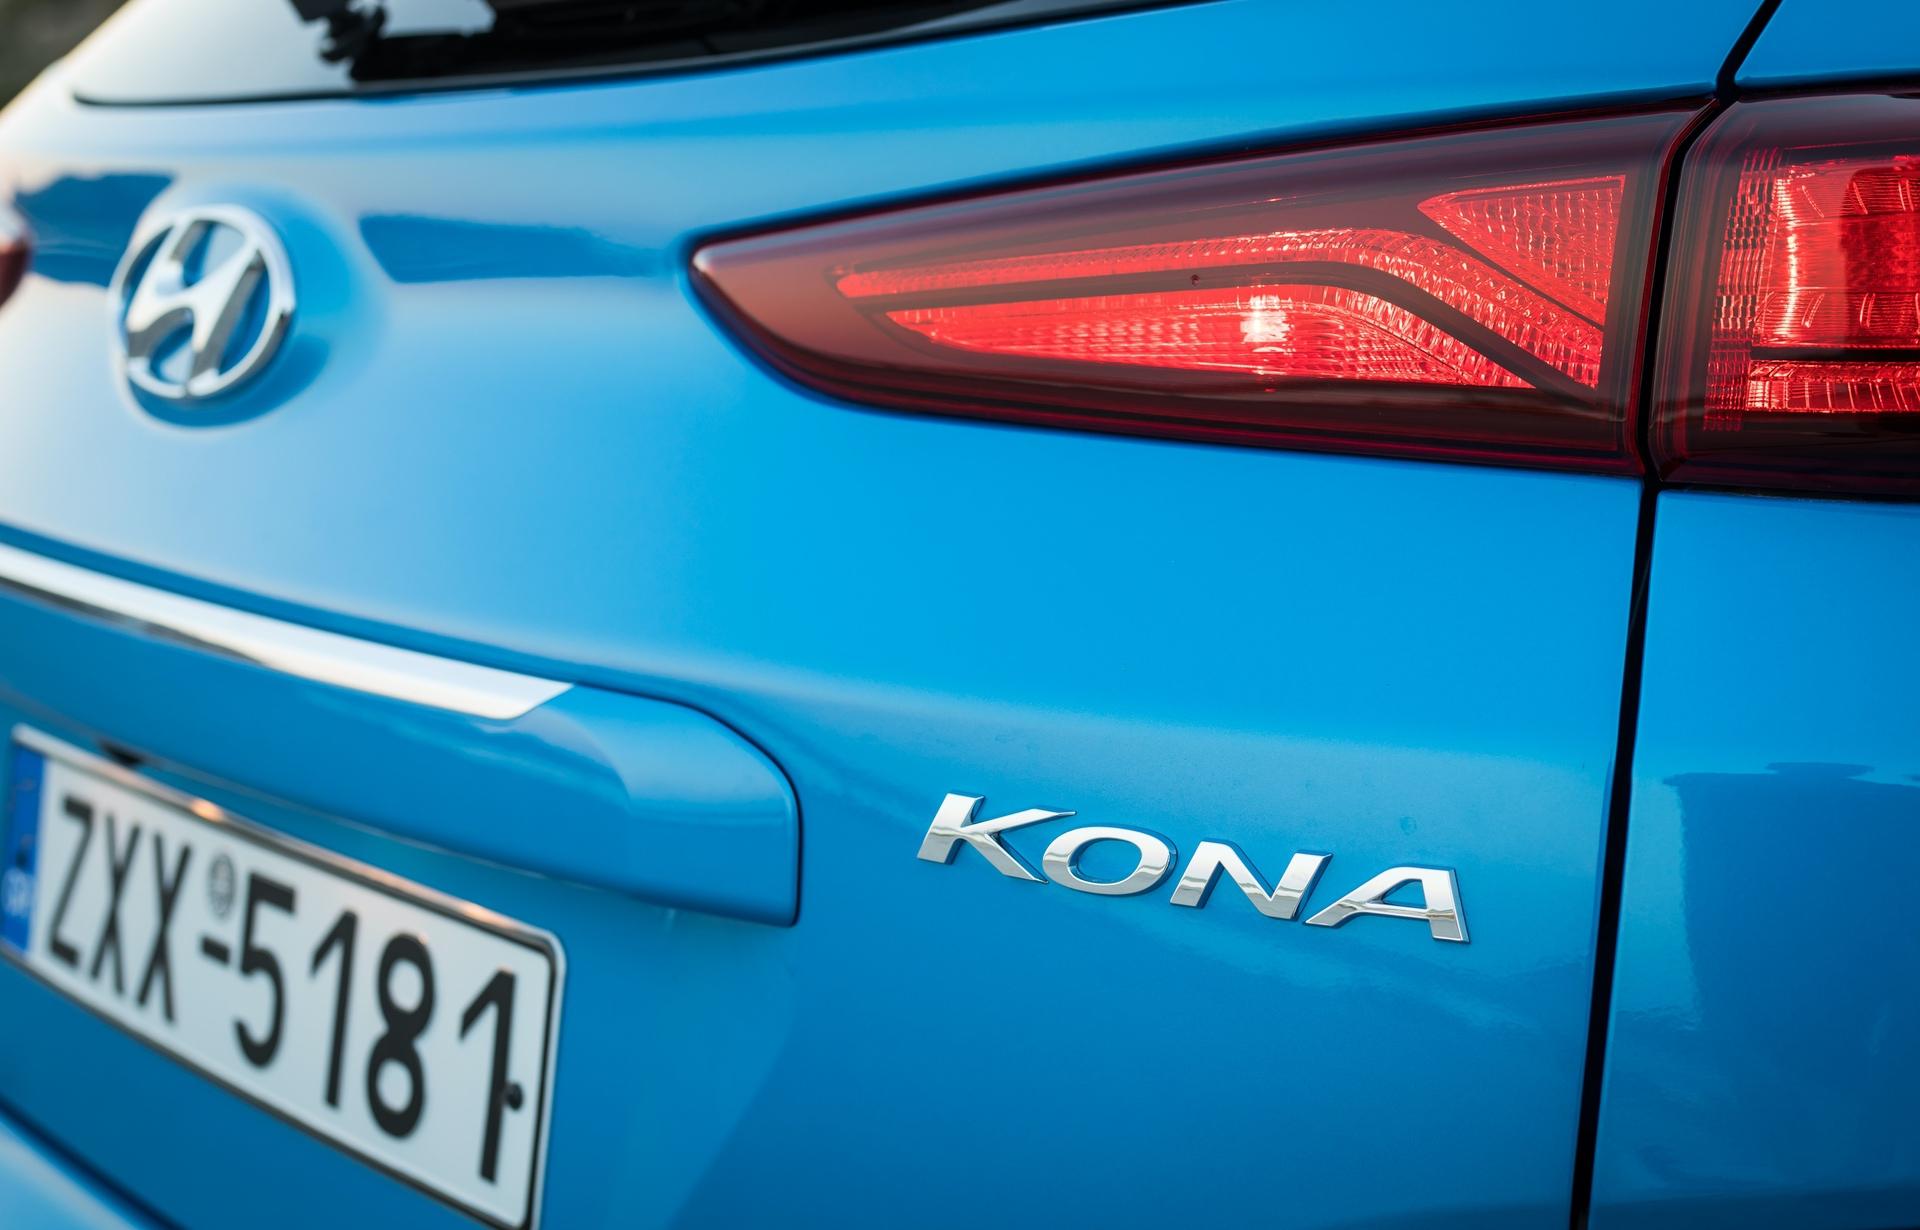 Hyundai_Kona_greek_presskit_0088